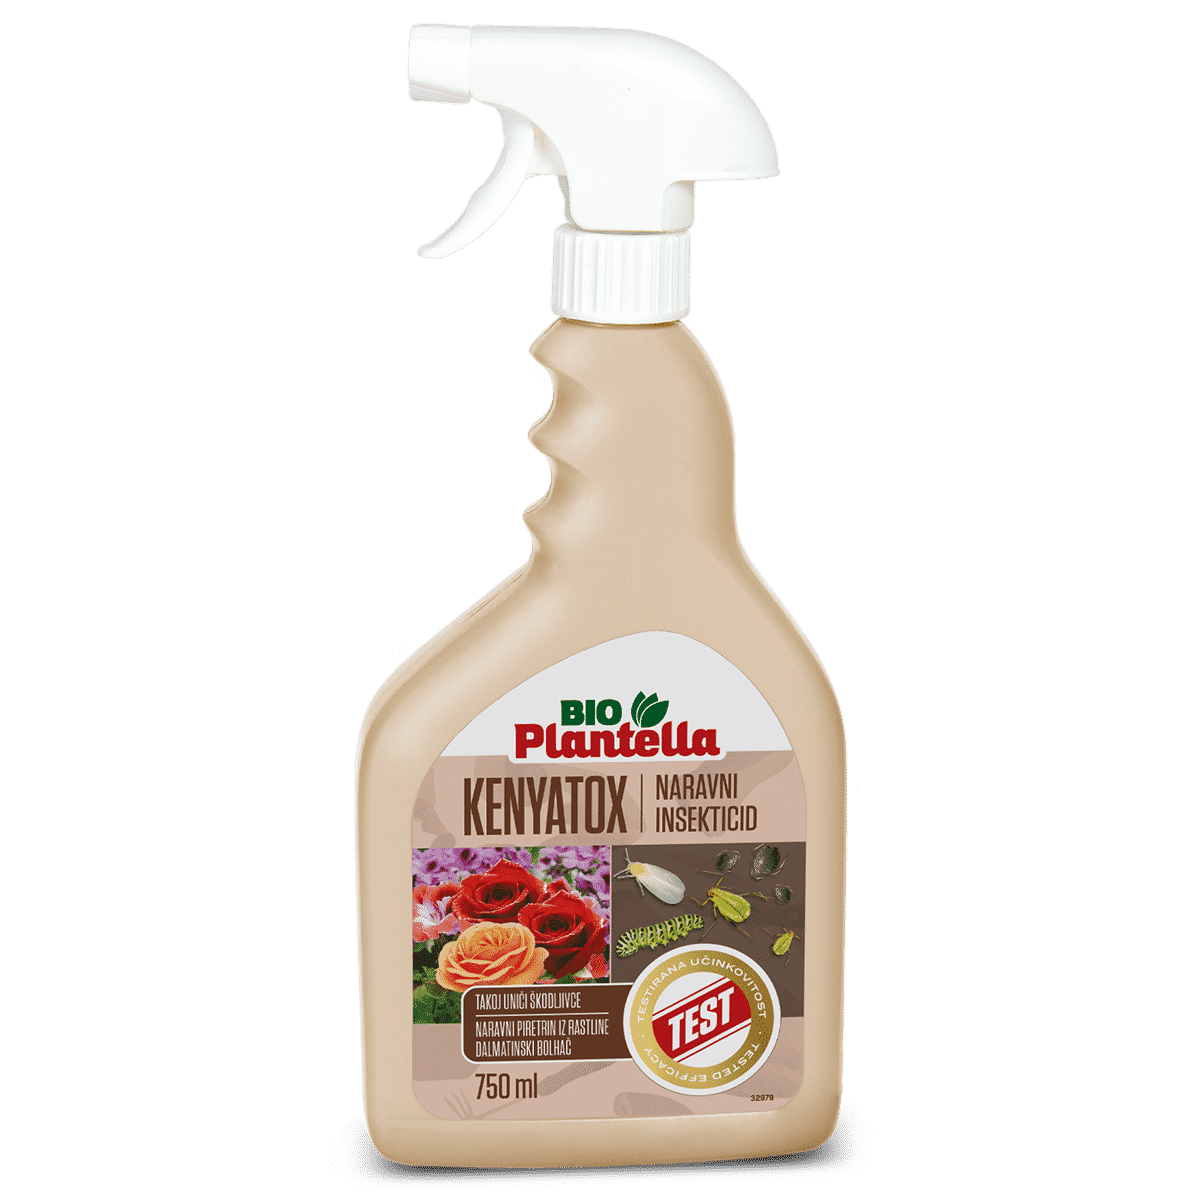 Bio Plantella Kenyatox 750 ml